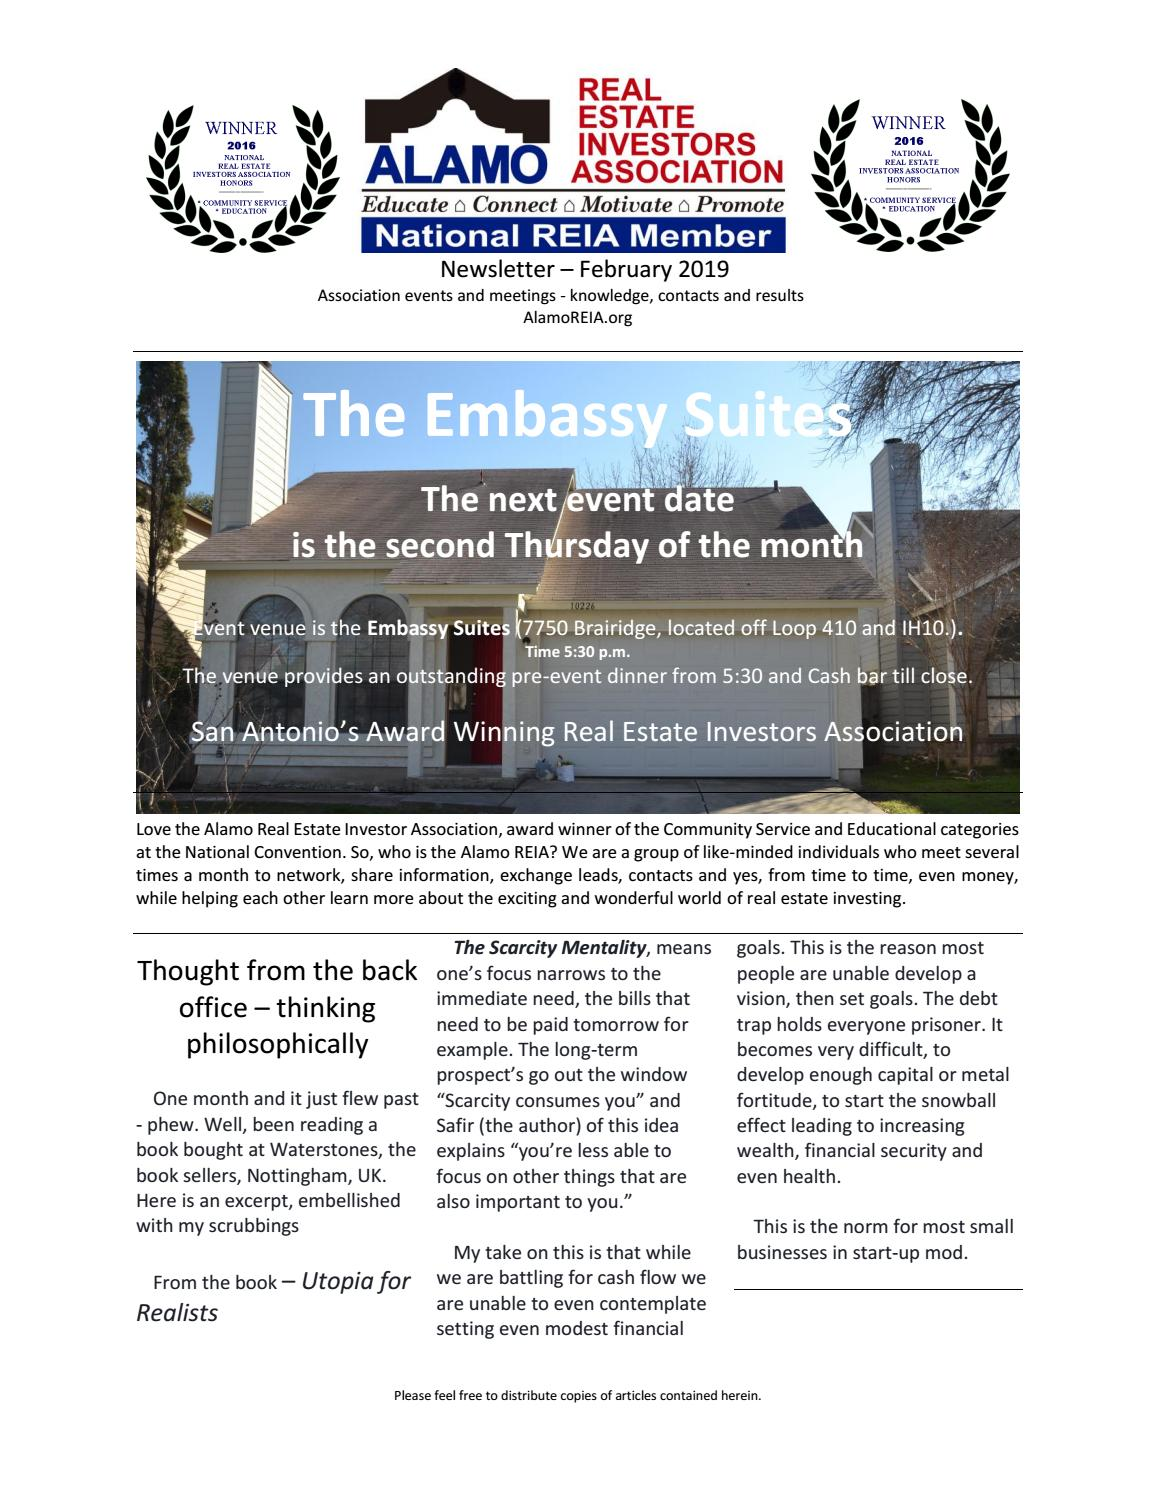 February 2019 Newsletter by AlamoREIA - issuu